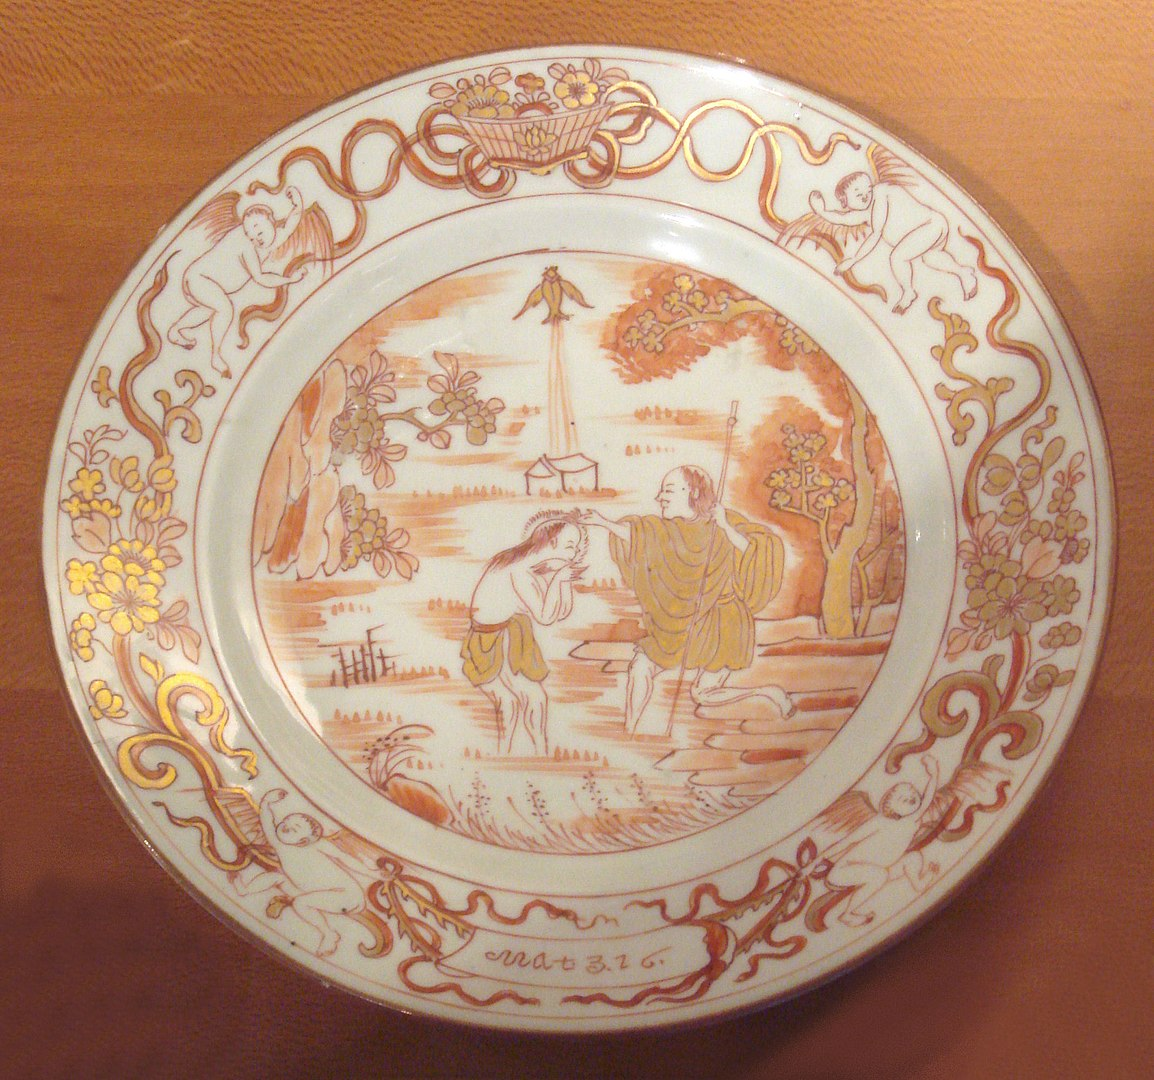 Qing export porcelain with European Christian scene, 1725–1735.